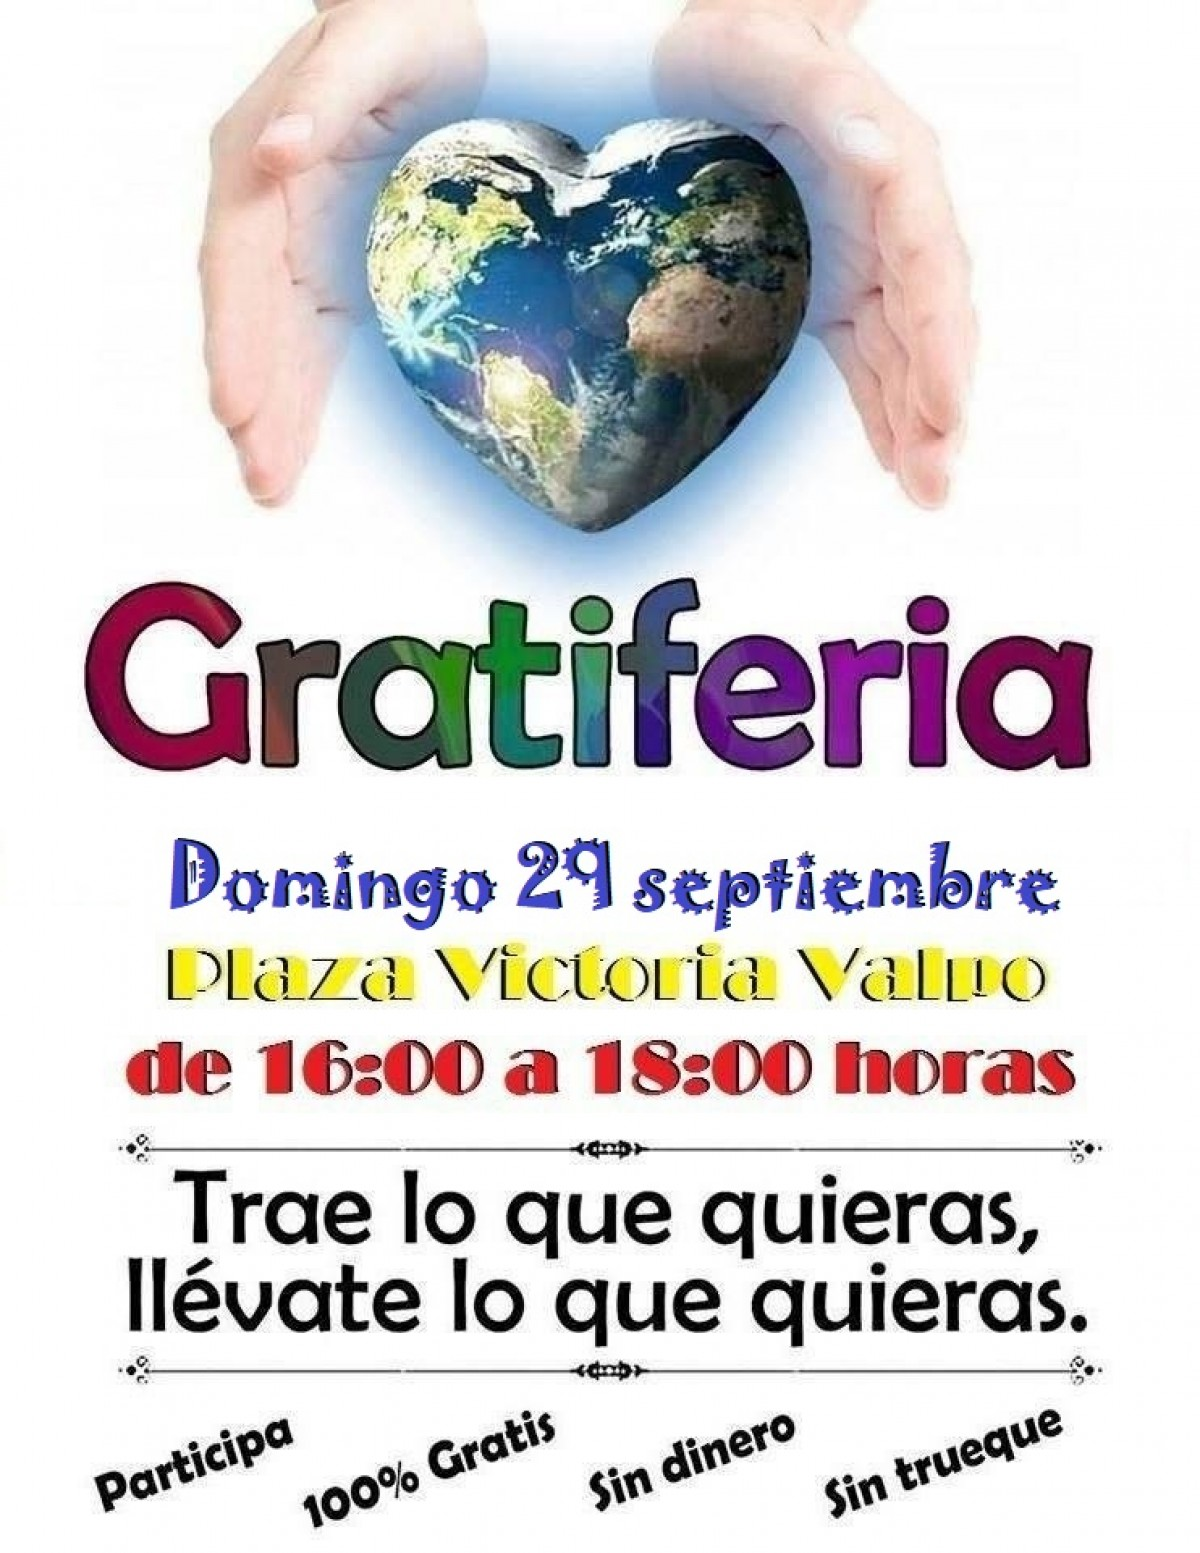 Gratiferia Plaza de la Victoria - 29 septiembre